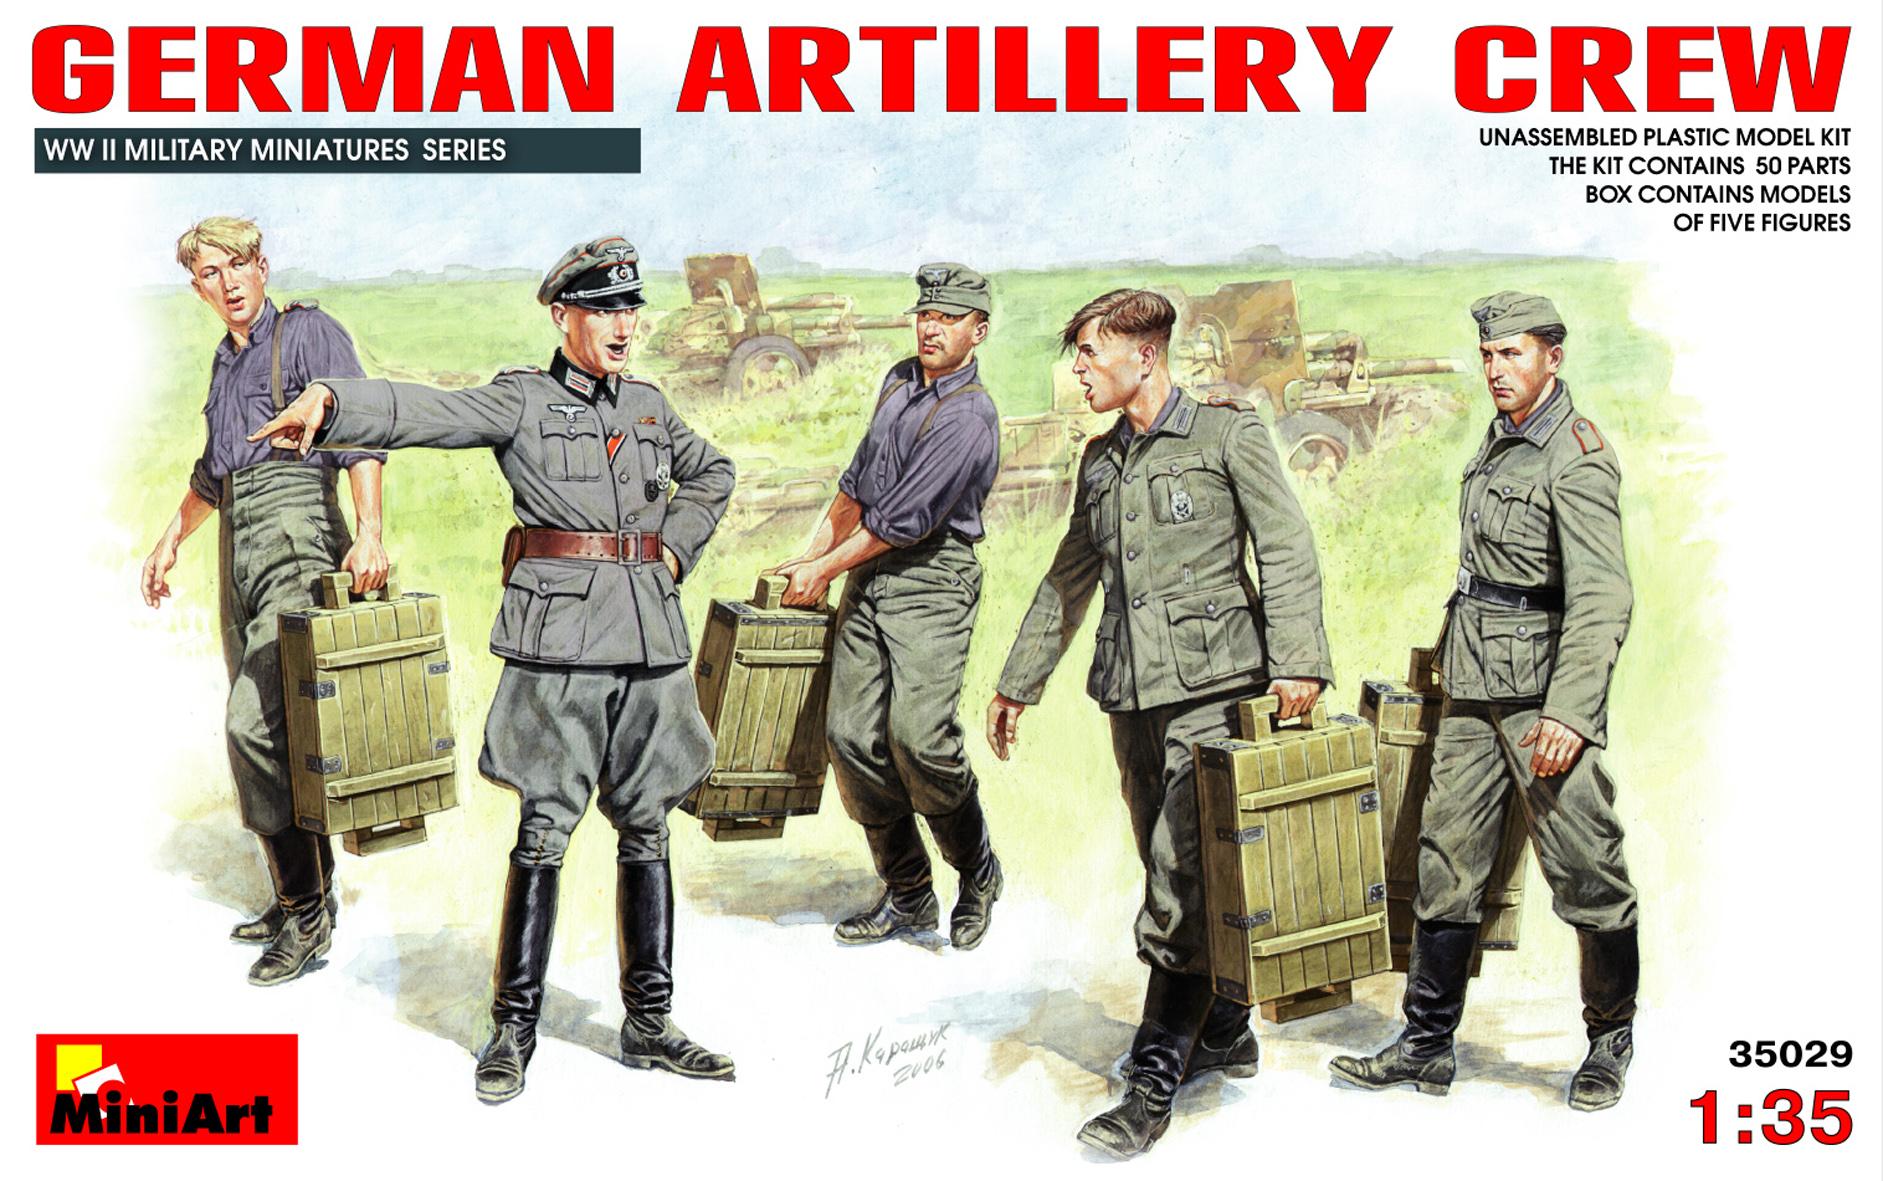 GERMAN ARTILLERY CREW